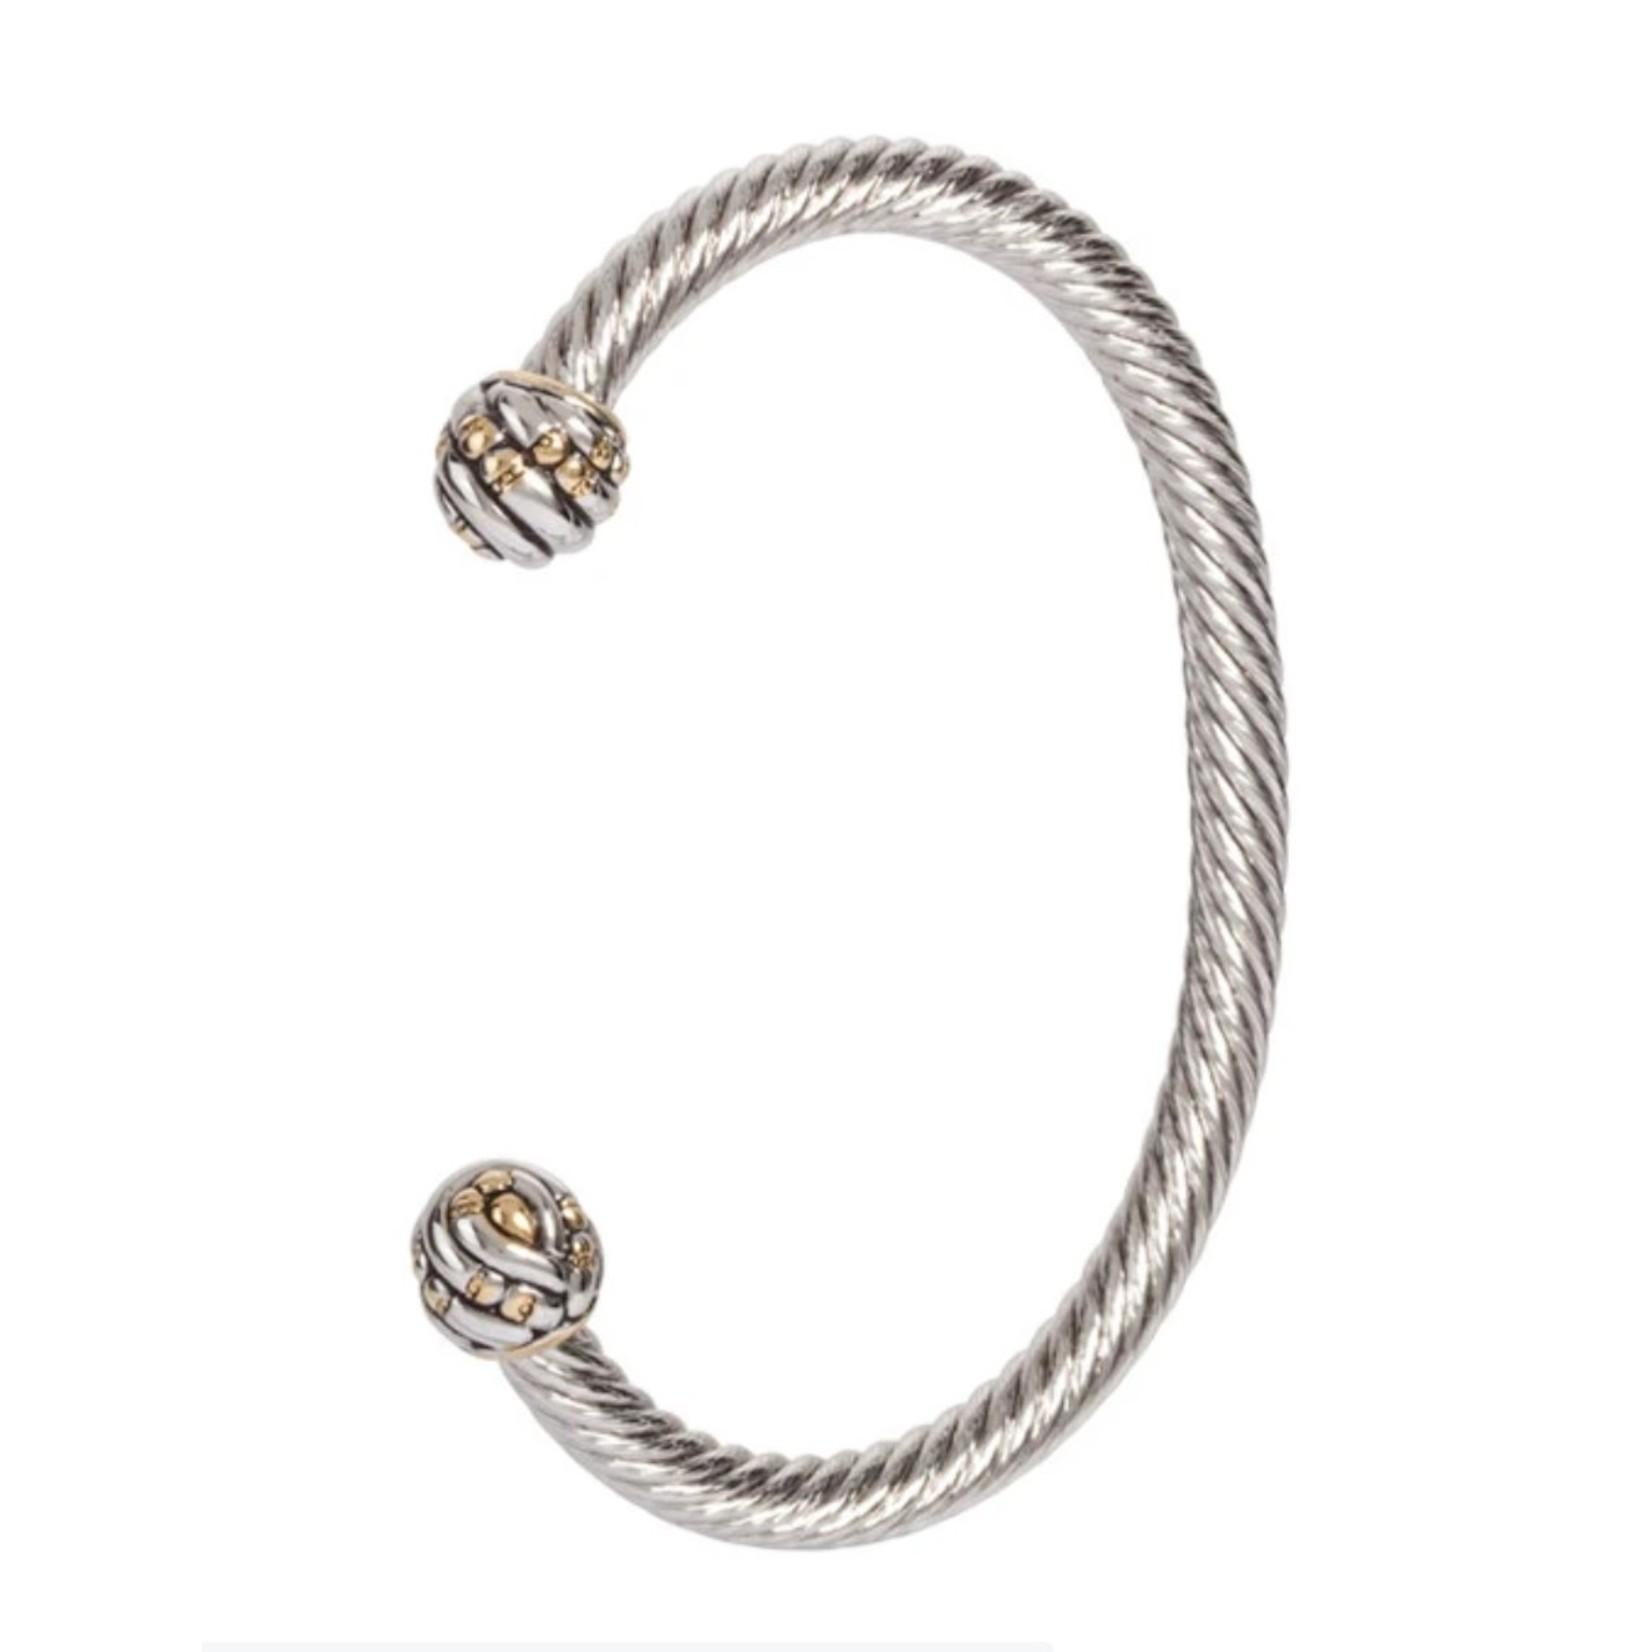 John Medeiros John Mederios Canias Medium Wire Cuff Bracelet